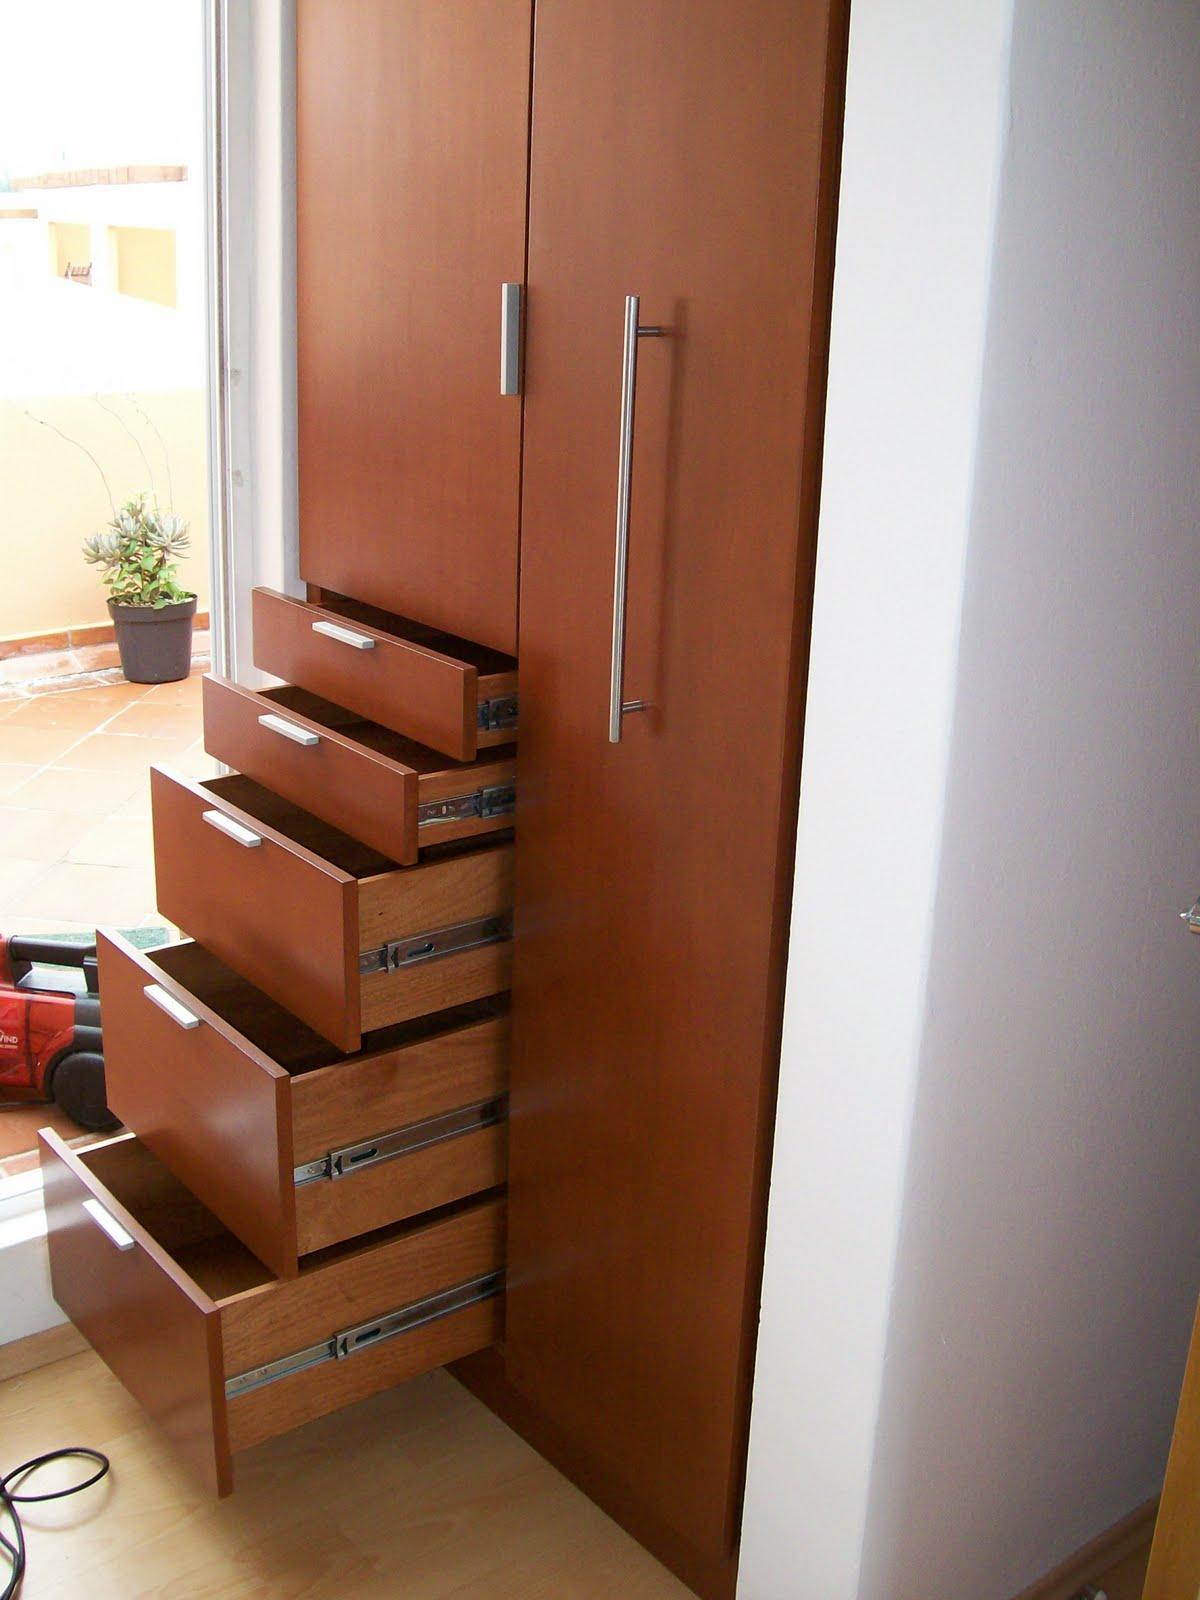 Muebles sobre dise o avl 1 04 10 1 05 10 for Diseno zapateras para closet